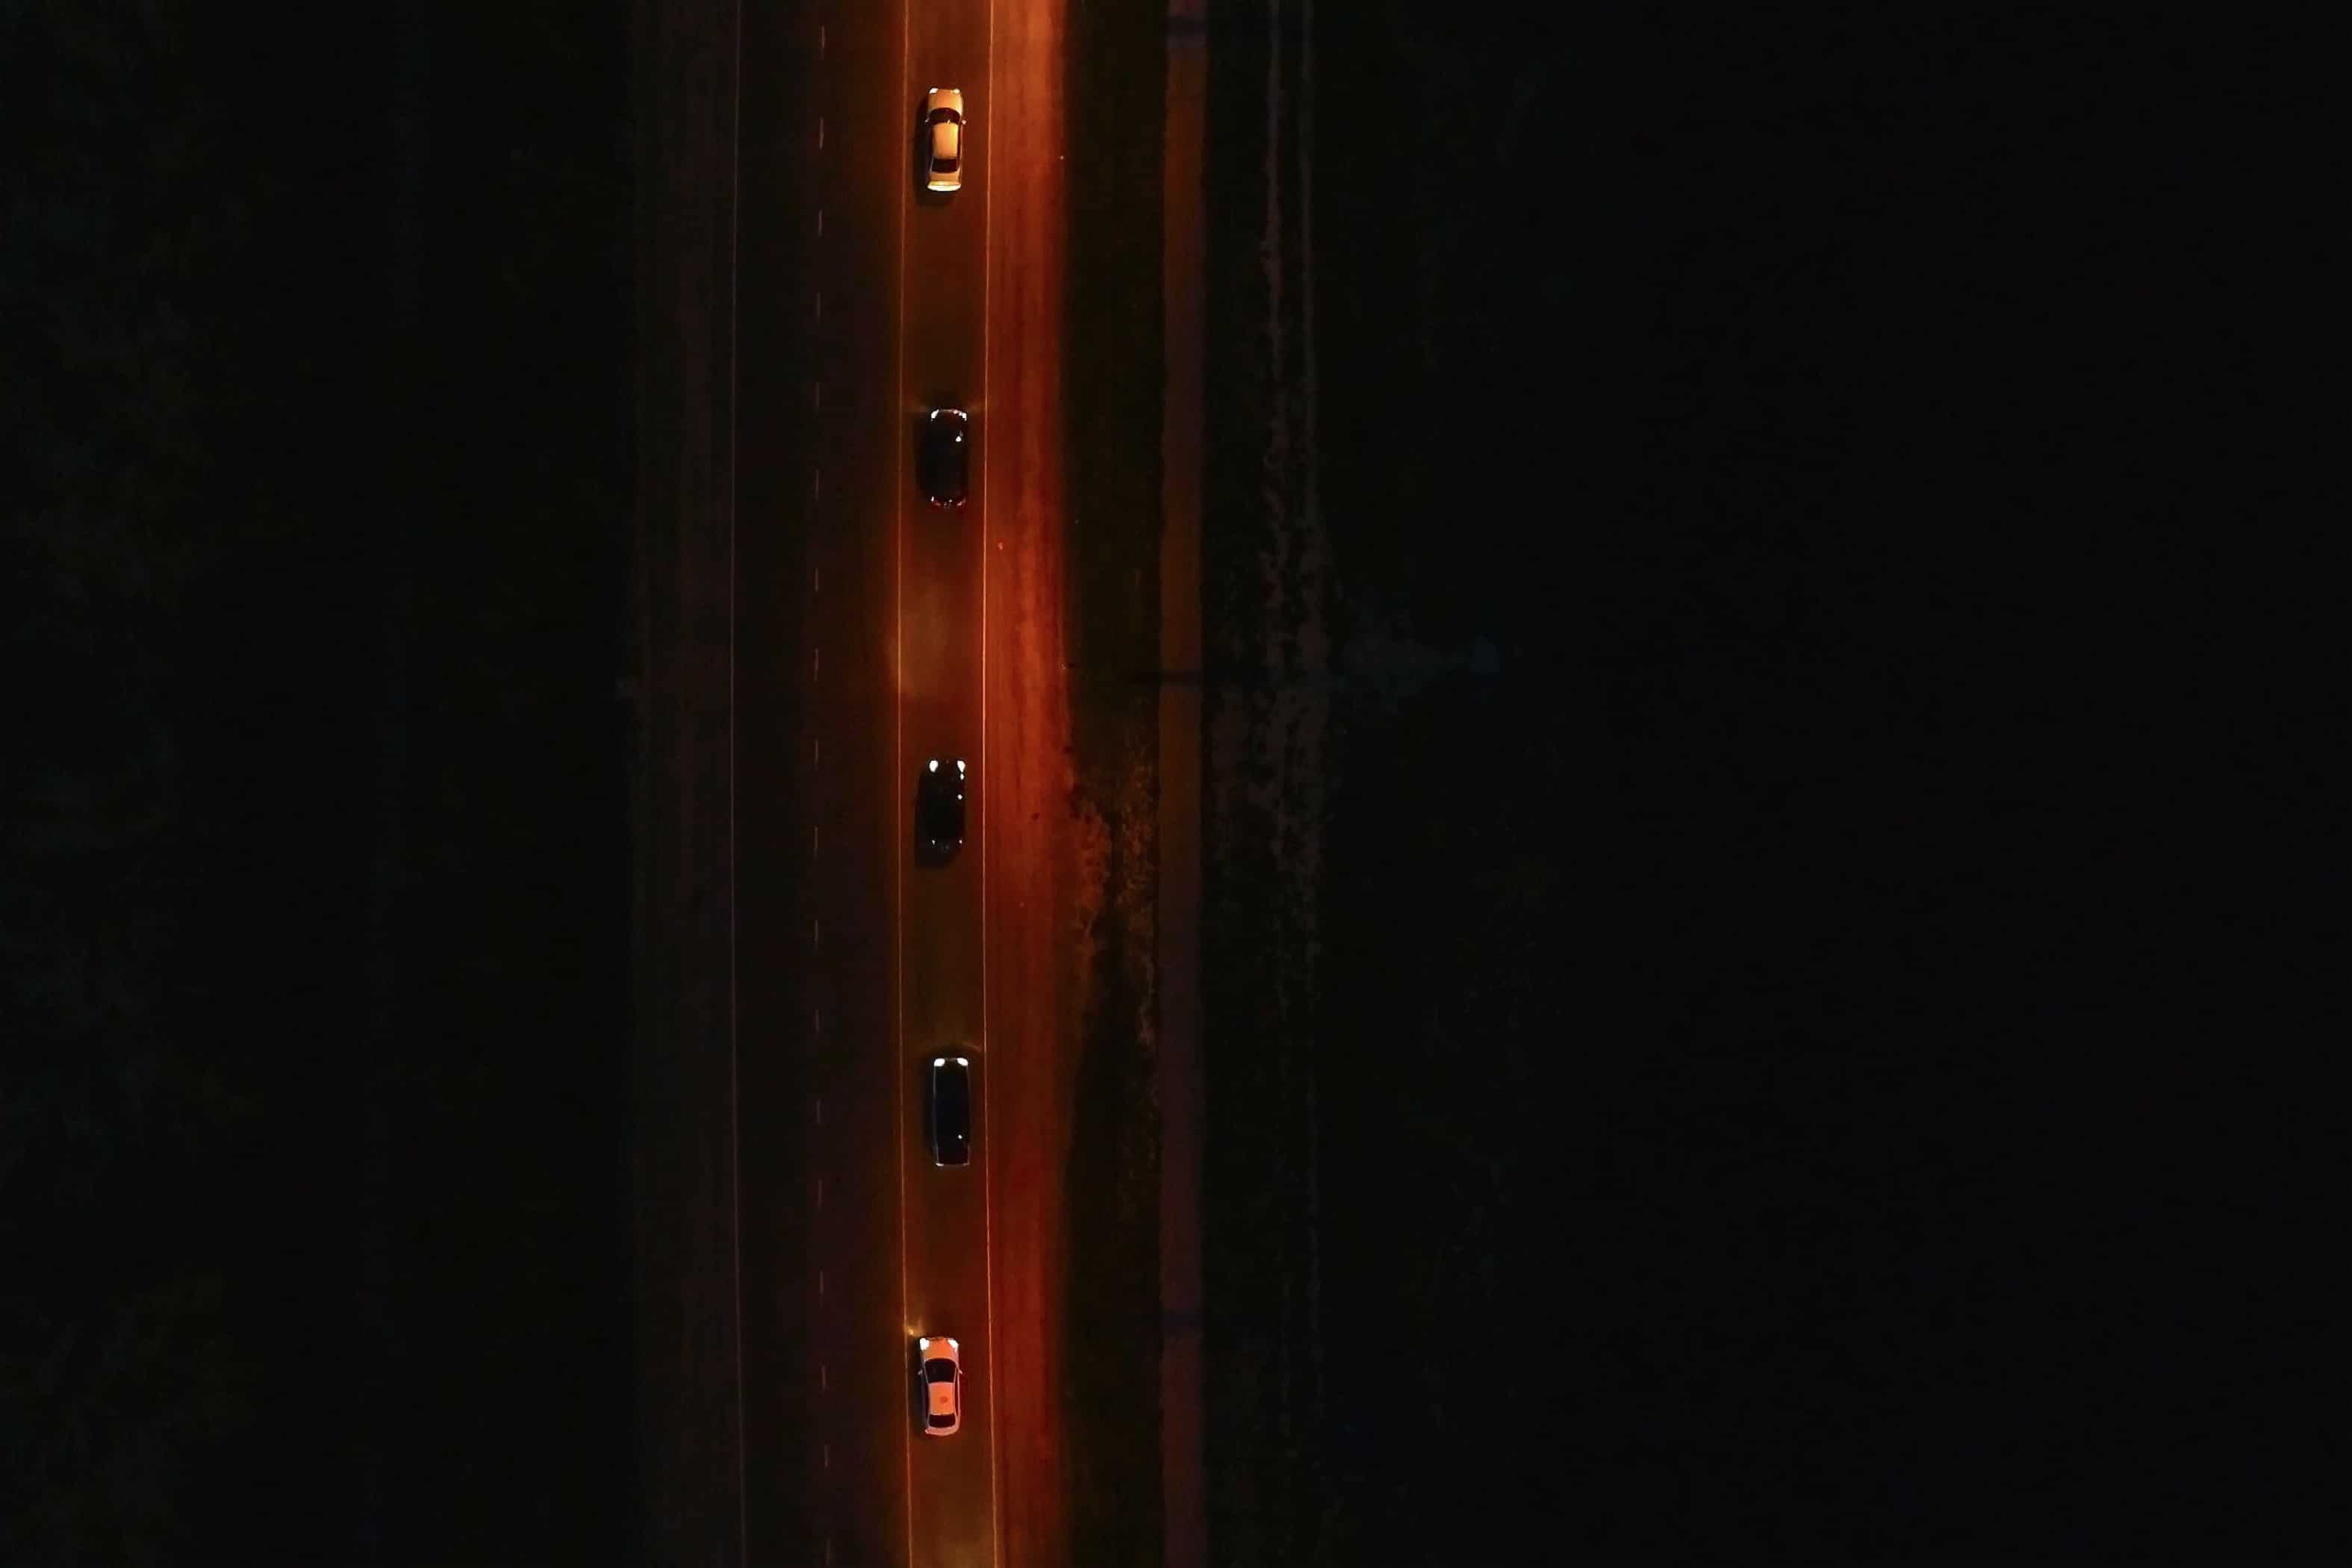 Tony Lydell McCray Identified as Man Killed in 605 Freeway Crash